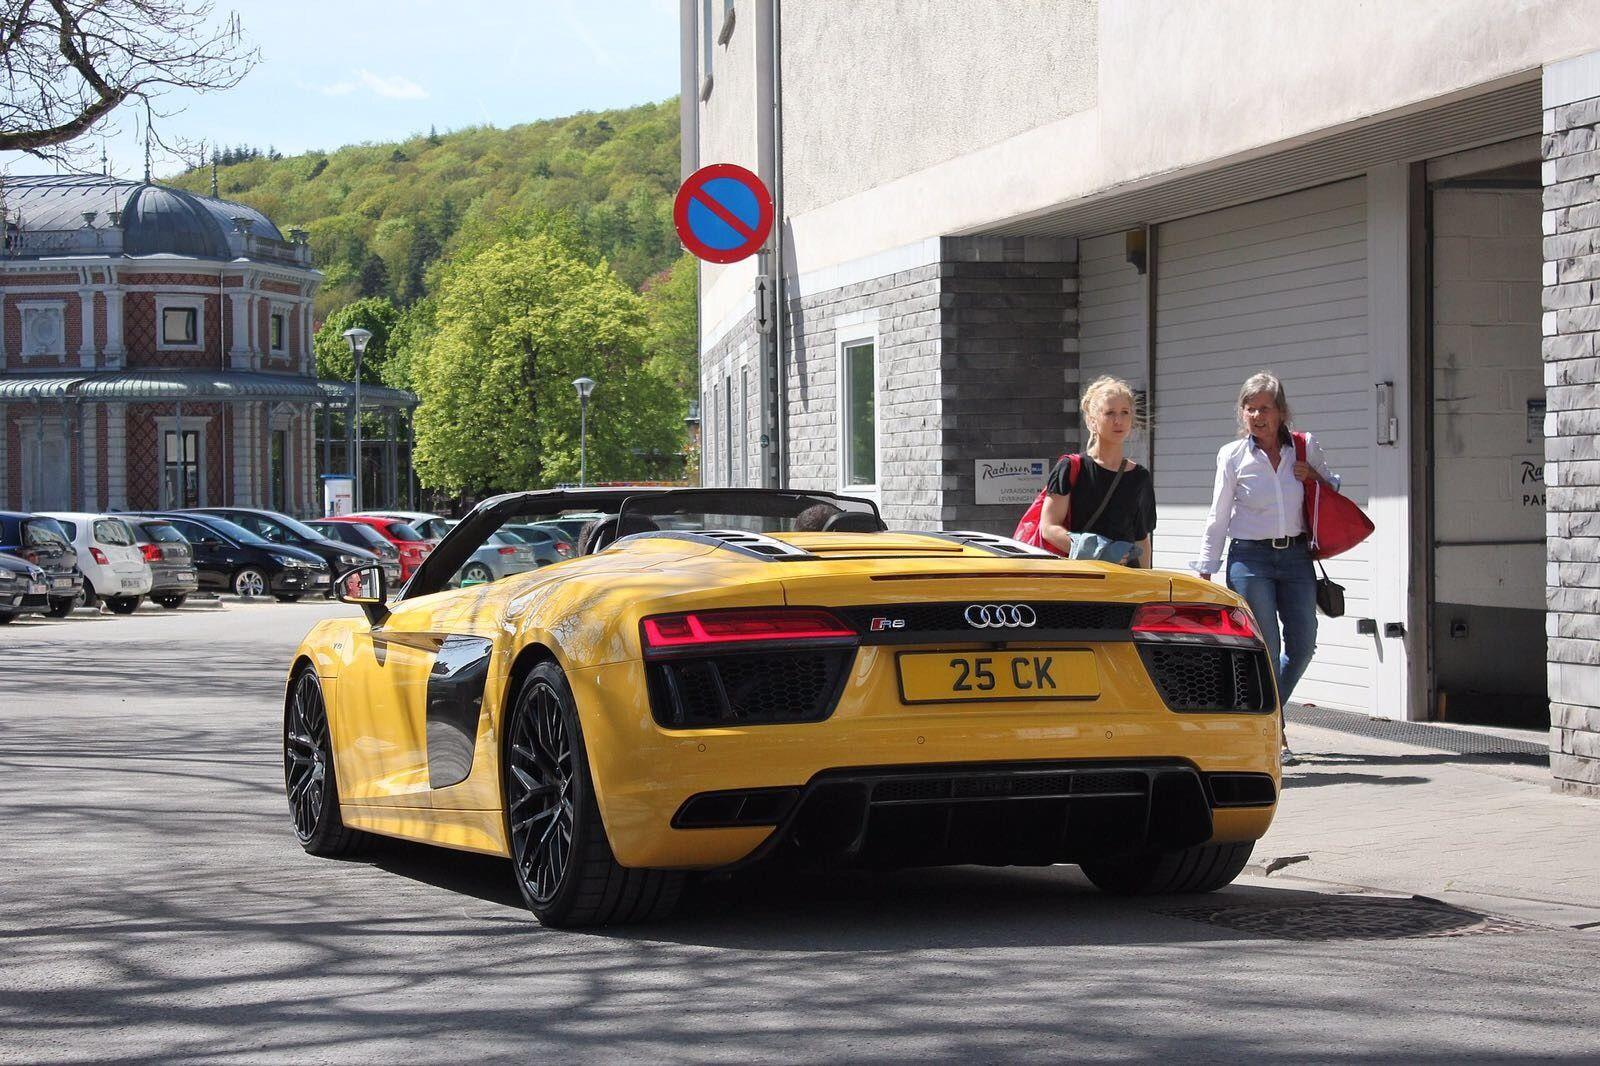 Audi audi r8 spyder v10 : Audi R8 Spyder V10 Plus | CK Classic Cars